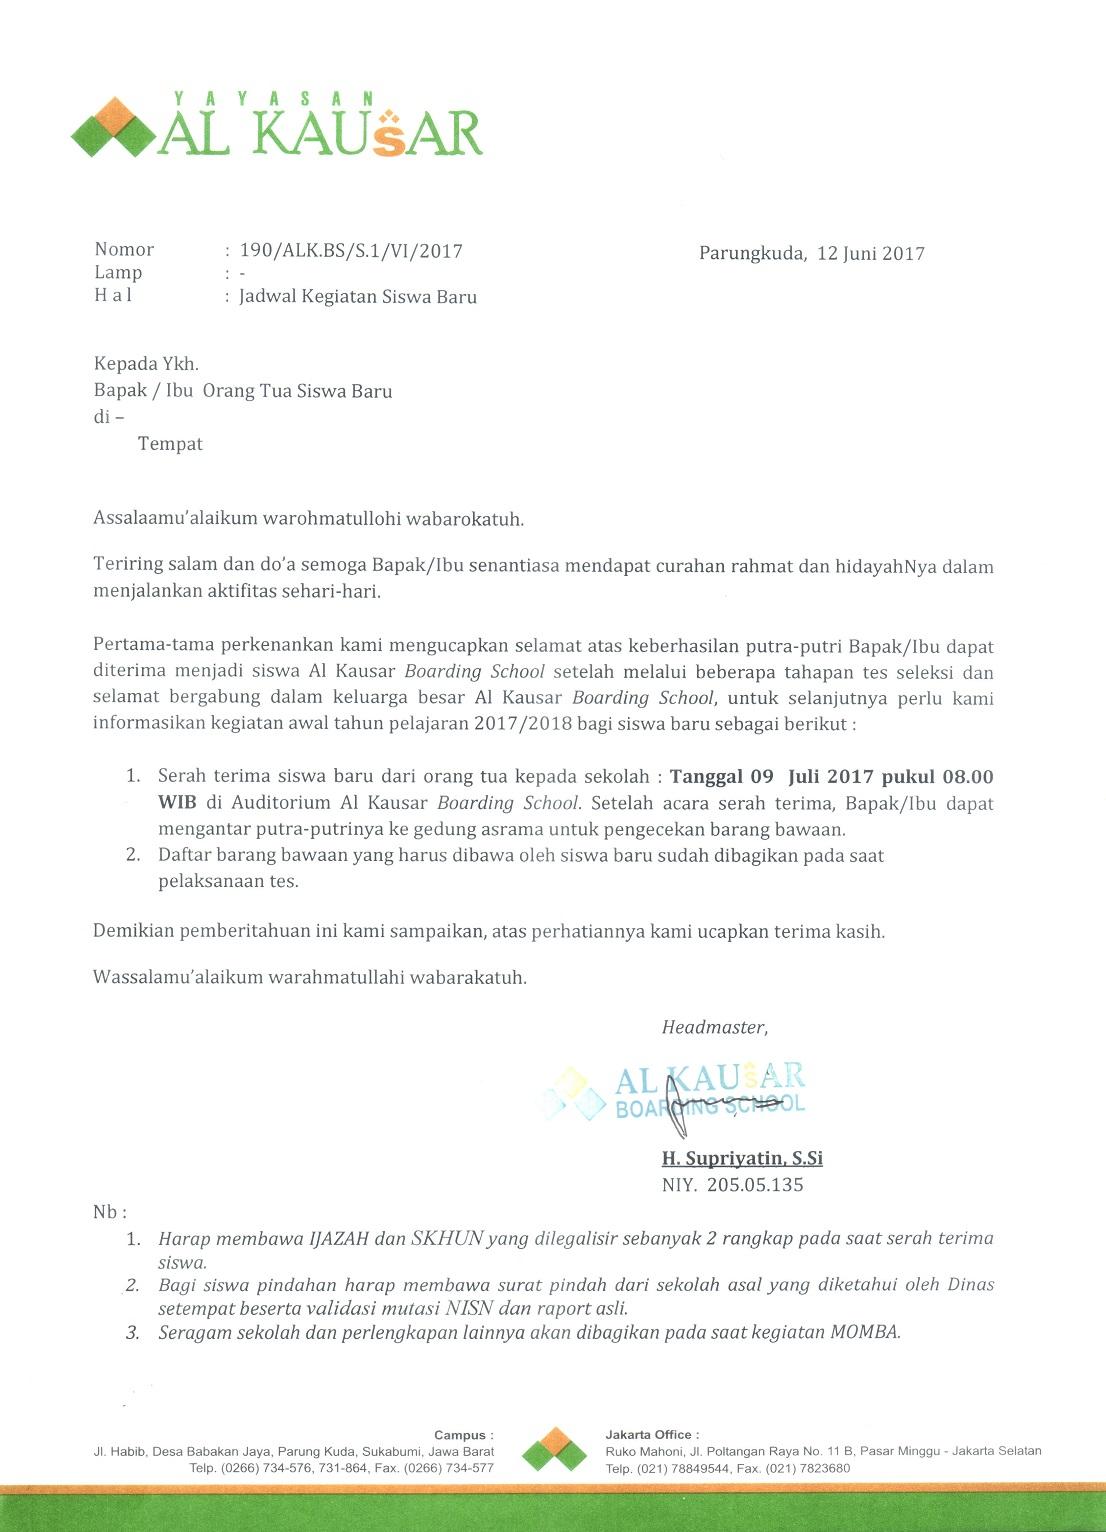 Surat edaran siswa baru